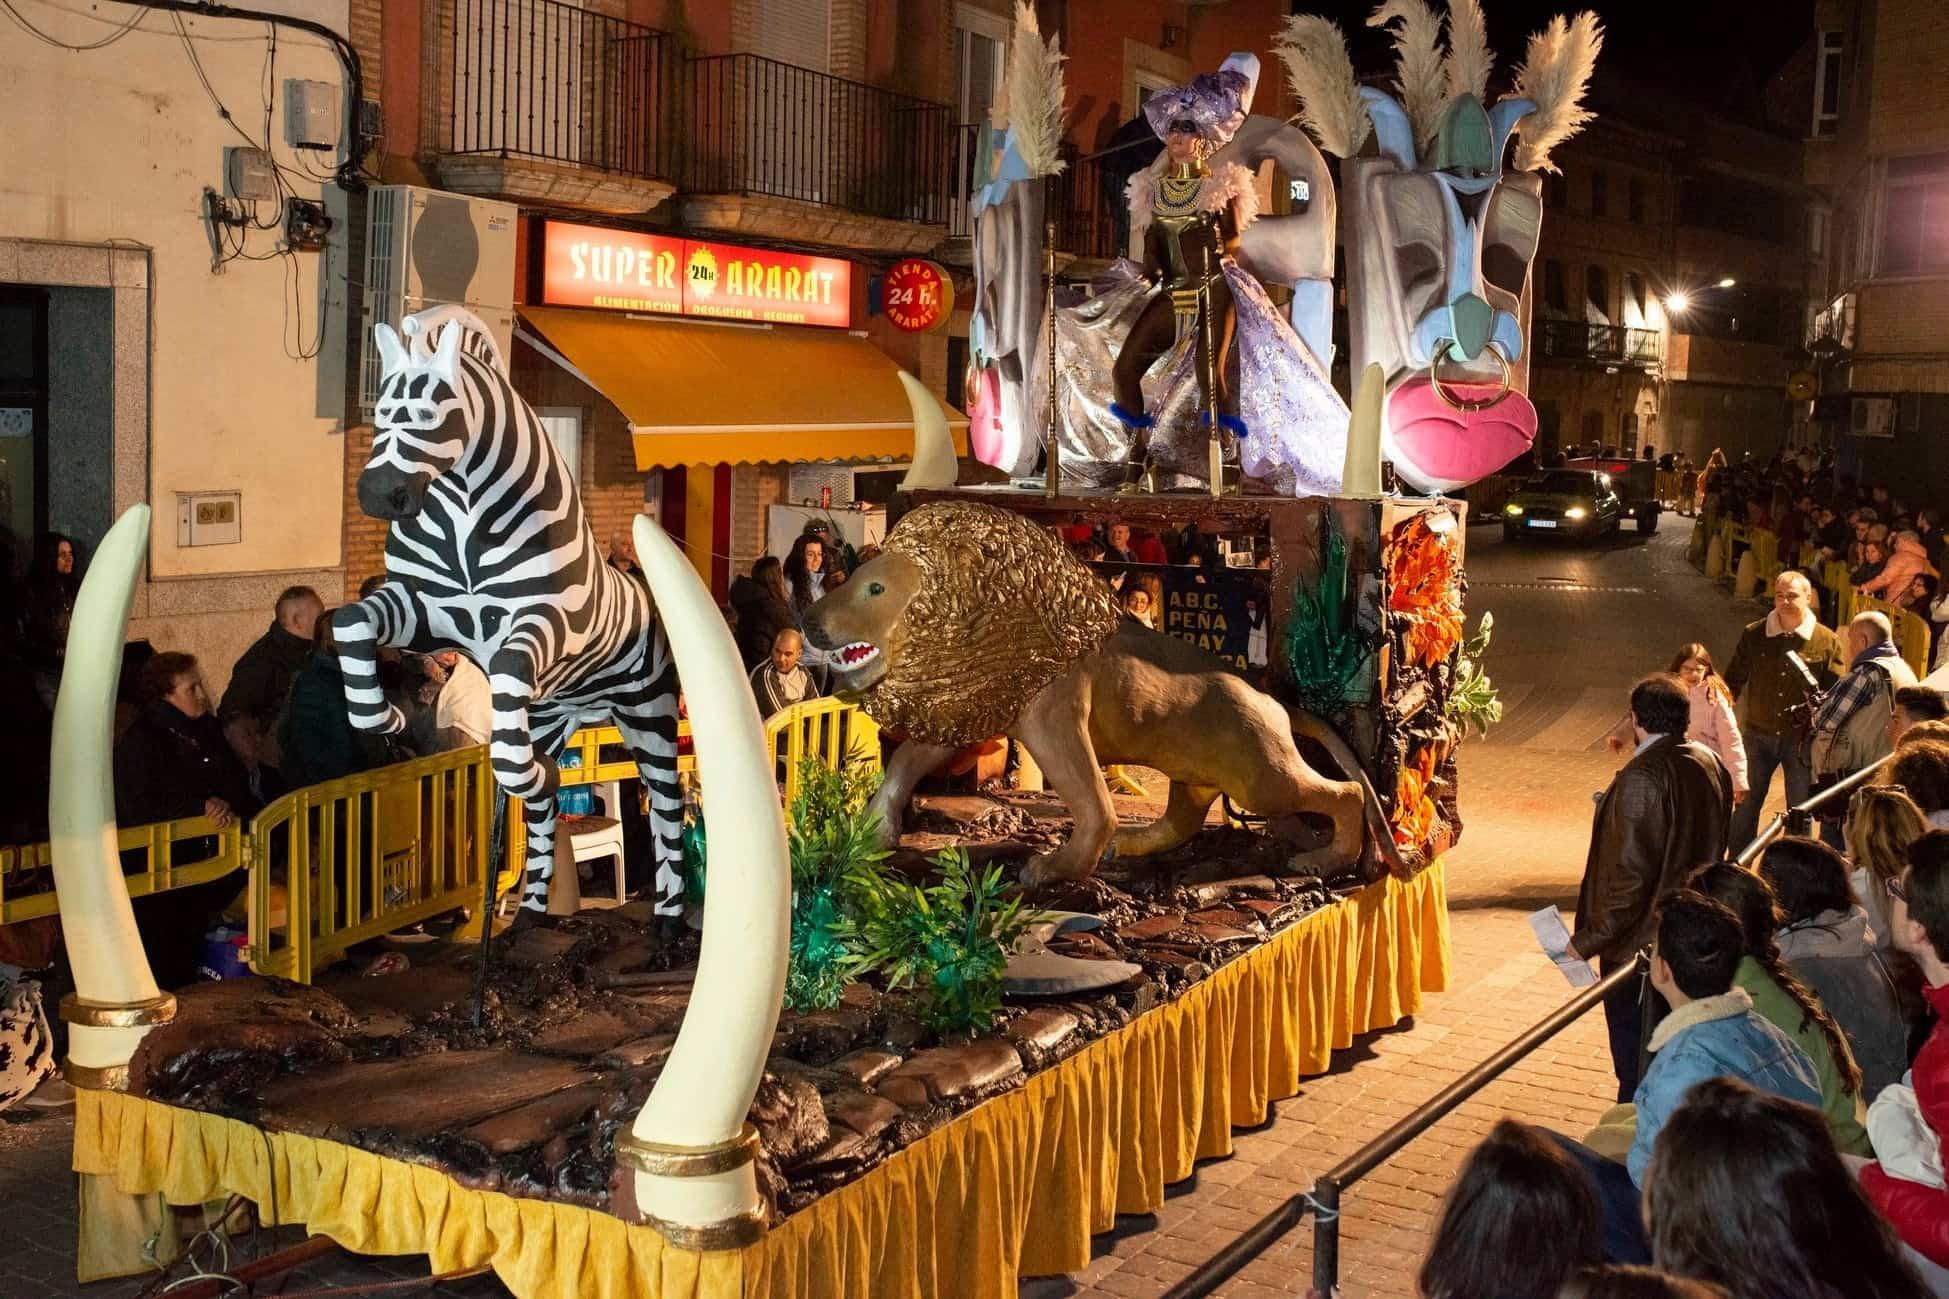 Carnaval de herencia 2020 ofertorio 49 - Selección de fotografías del Ofertorio del Carnaval de Herencia